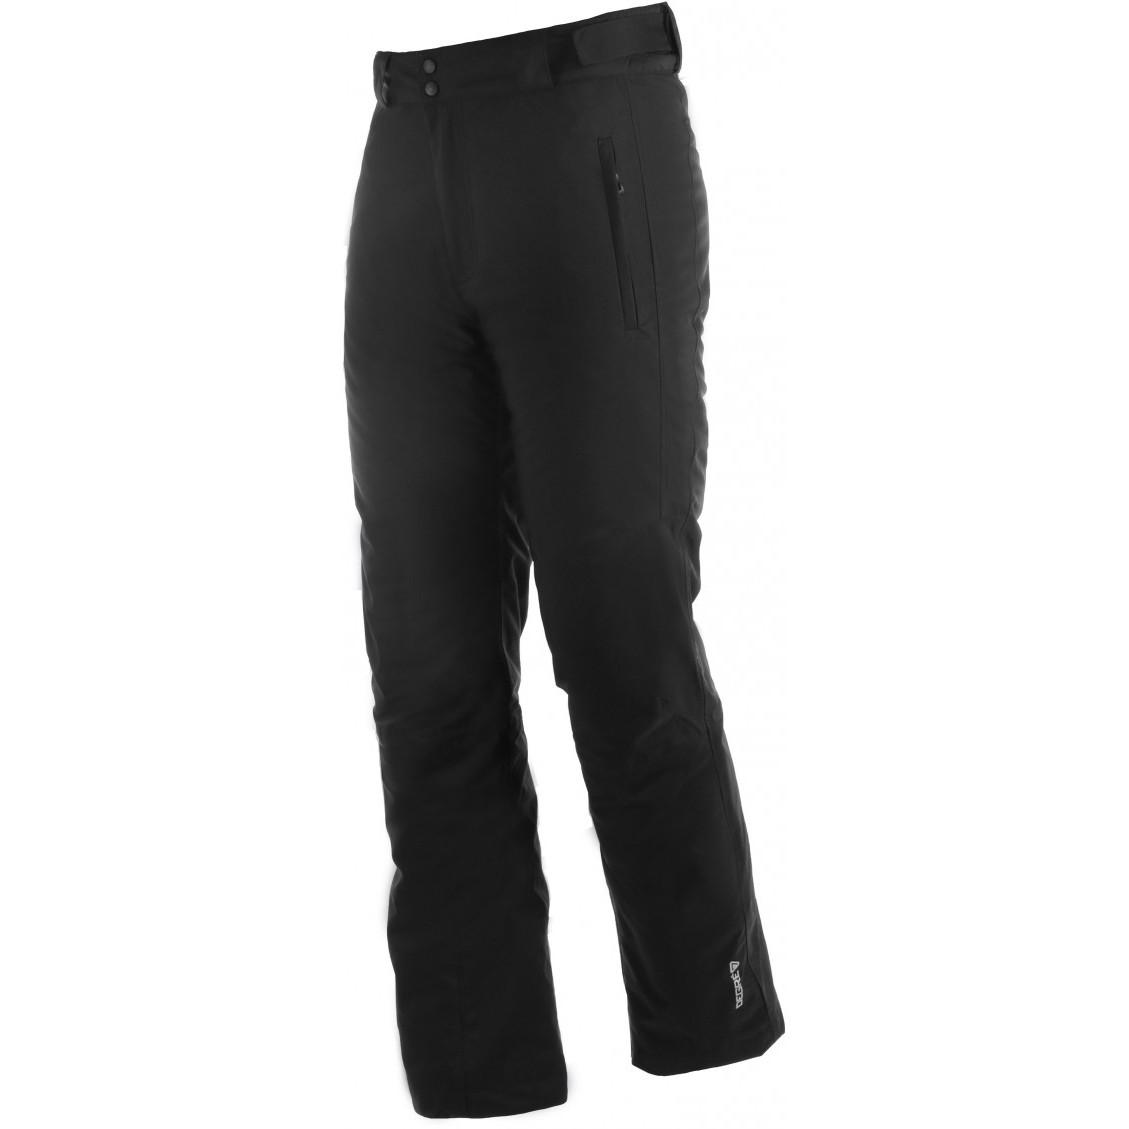 Pantalon de ski stretch femme